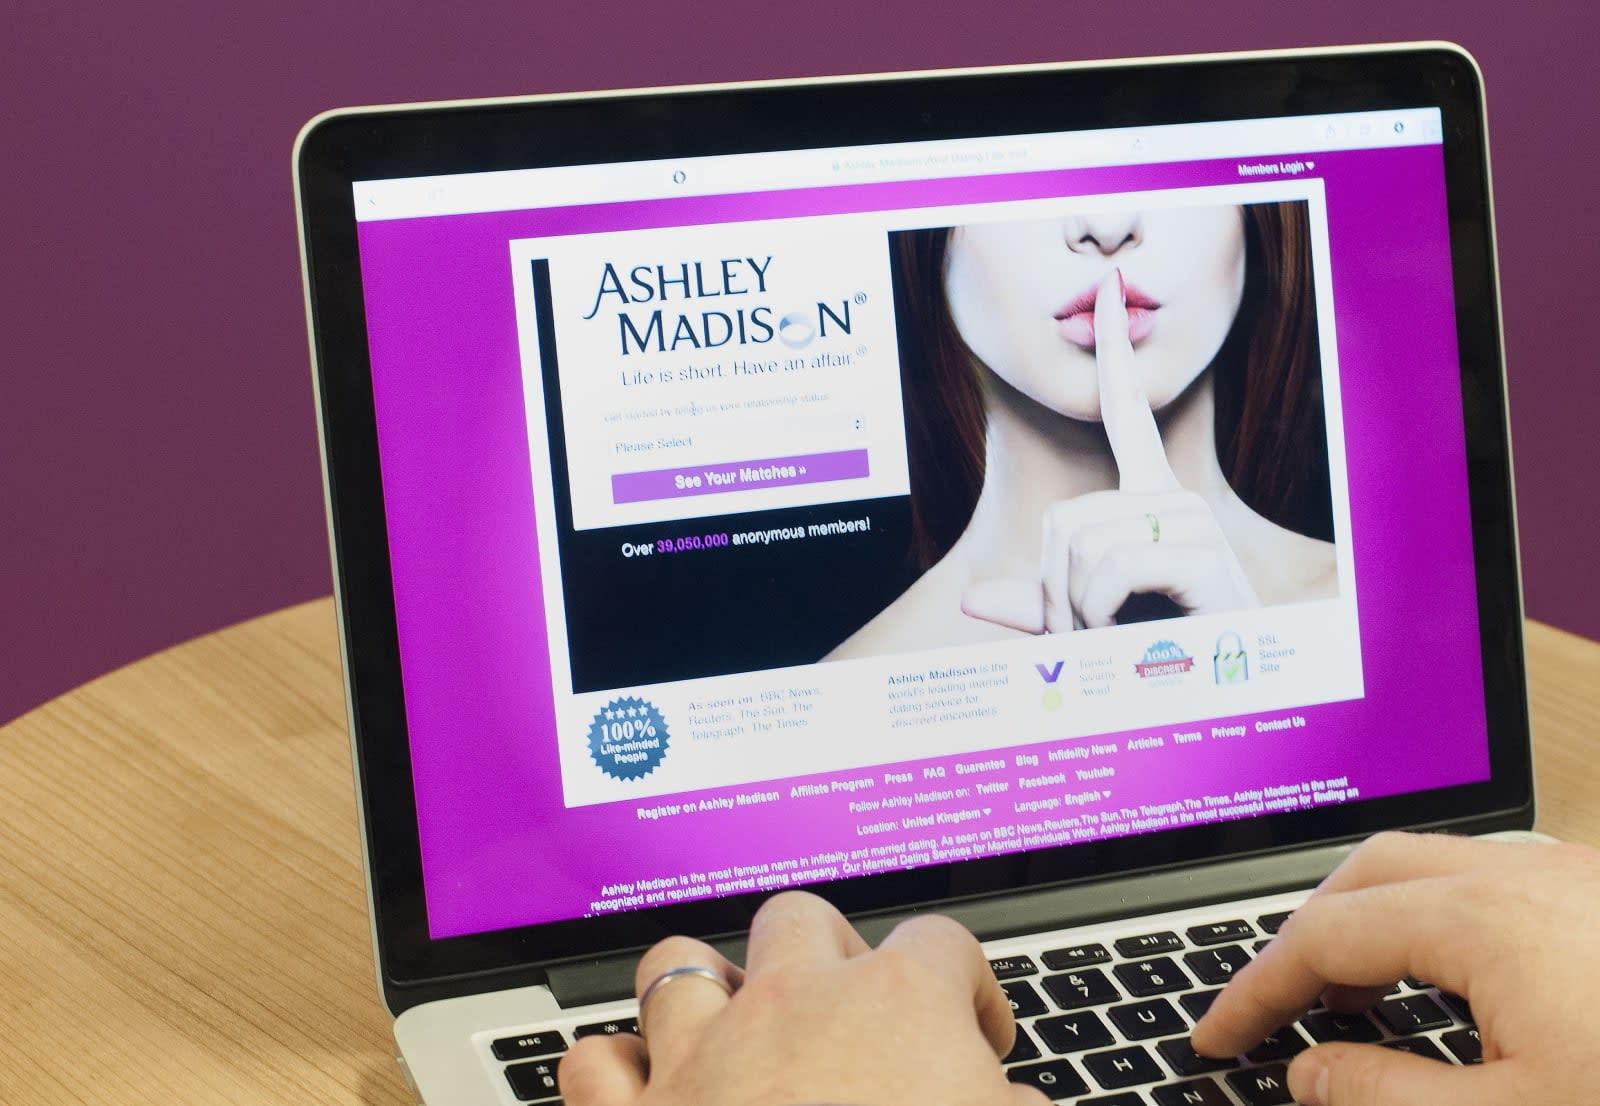 Ashley Madison attempts to regain the public's trust